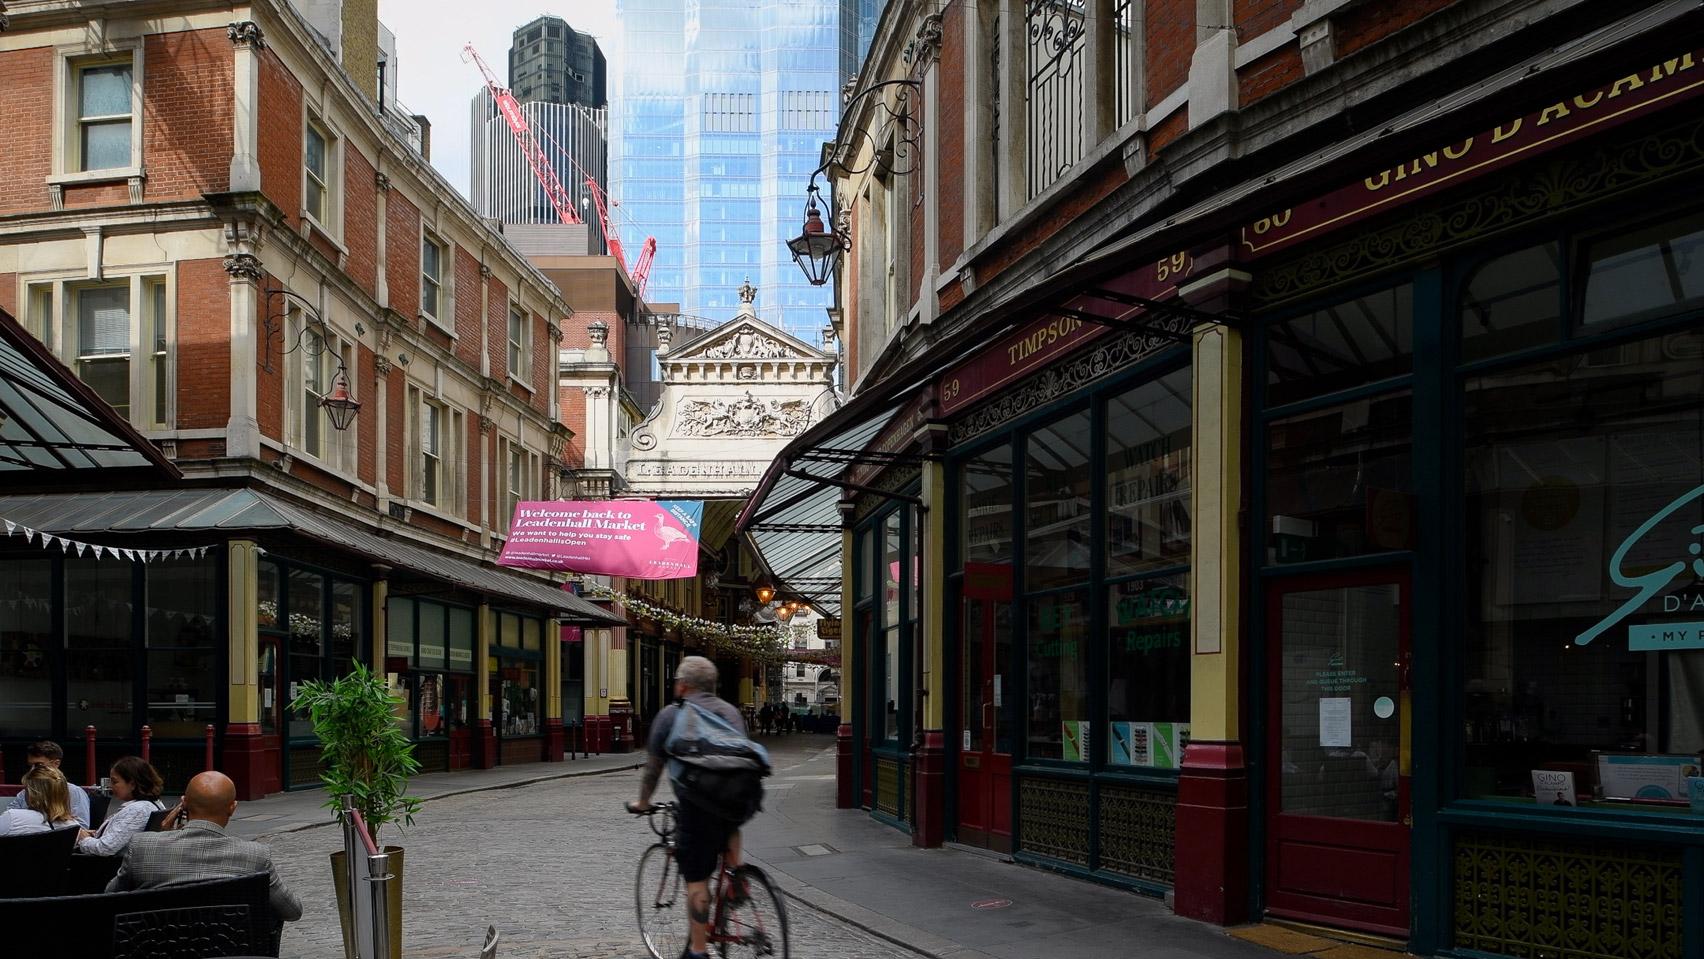 Leadenhall Market in London's financial district